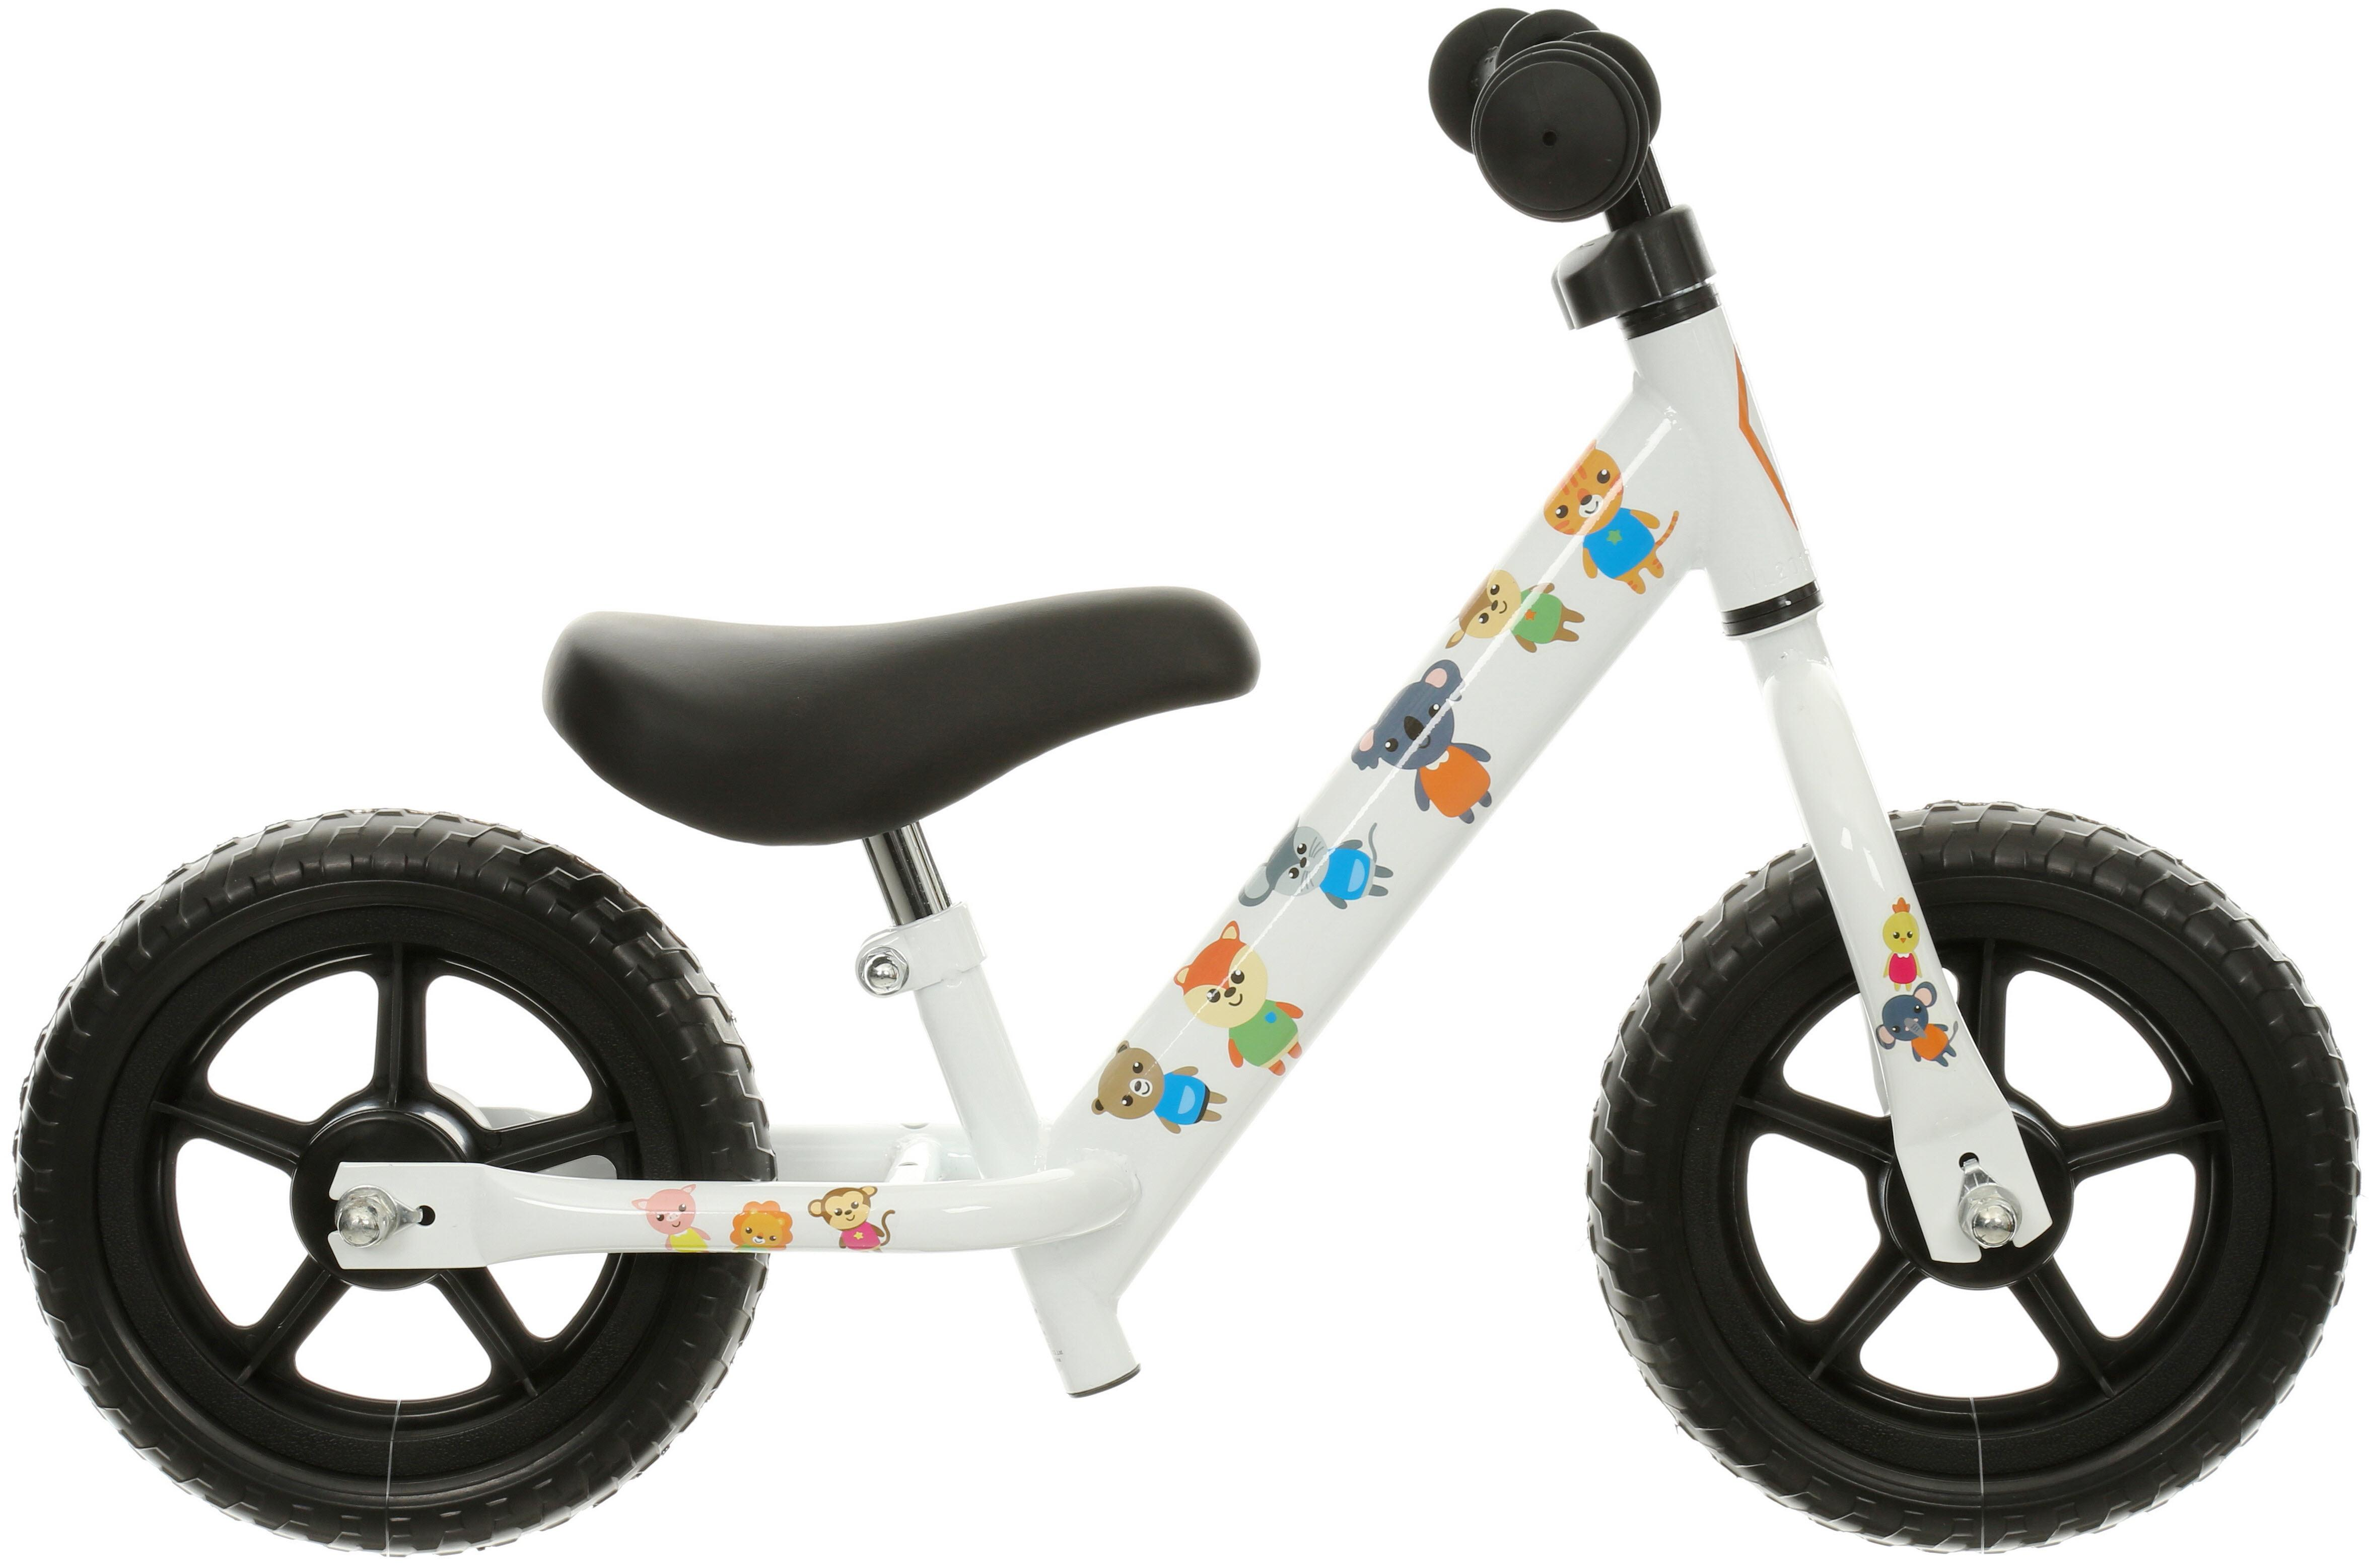 "Indi Adapt Balance Bike 10"" Plastic Wheels Strong Steel ...  Indi Adapt Bala..."